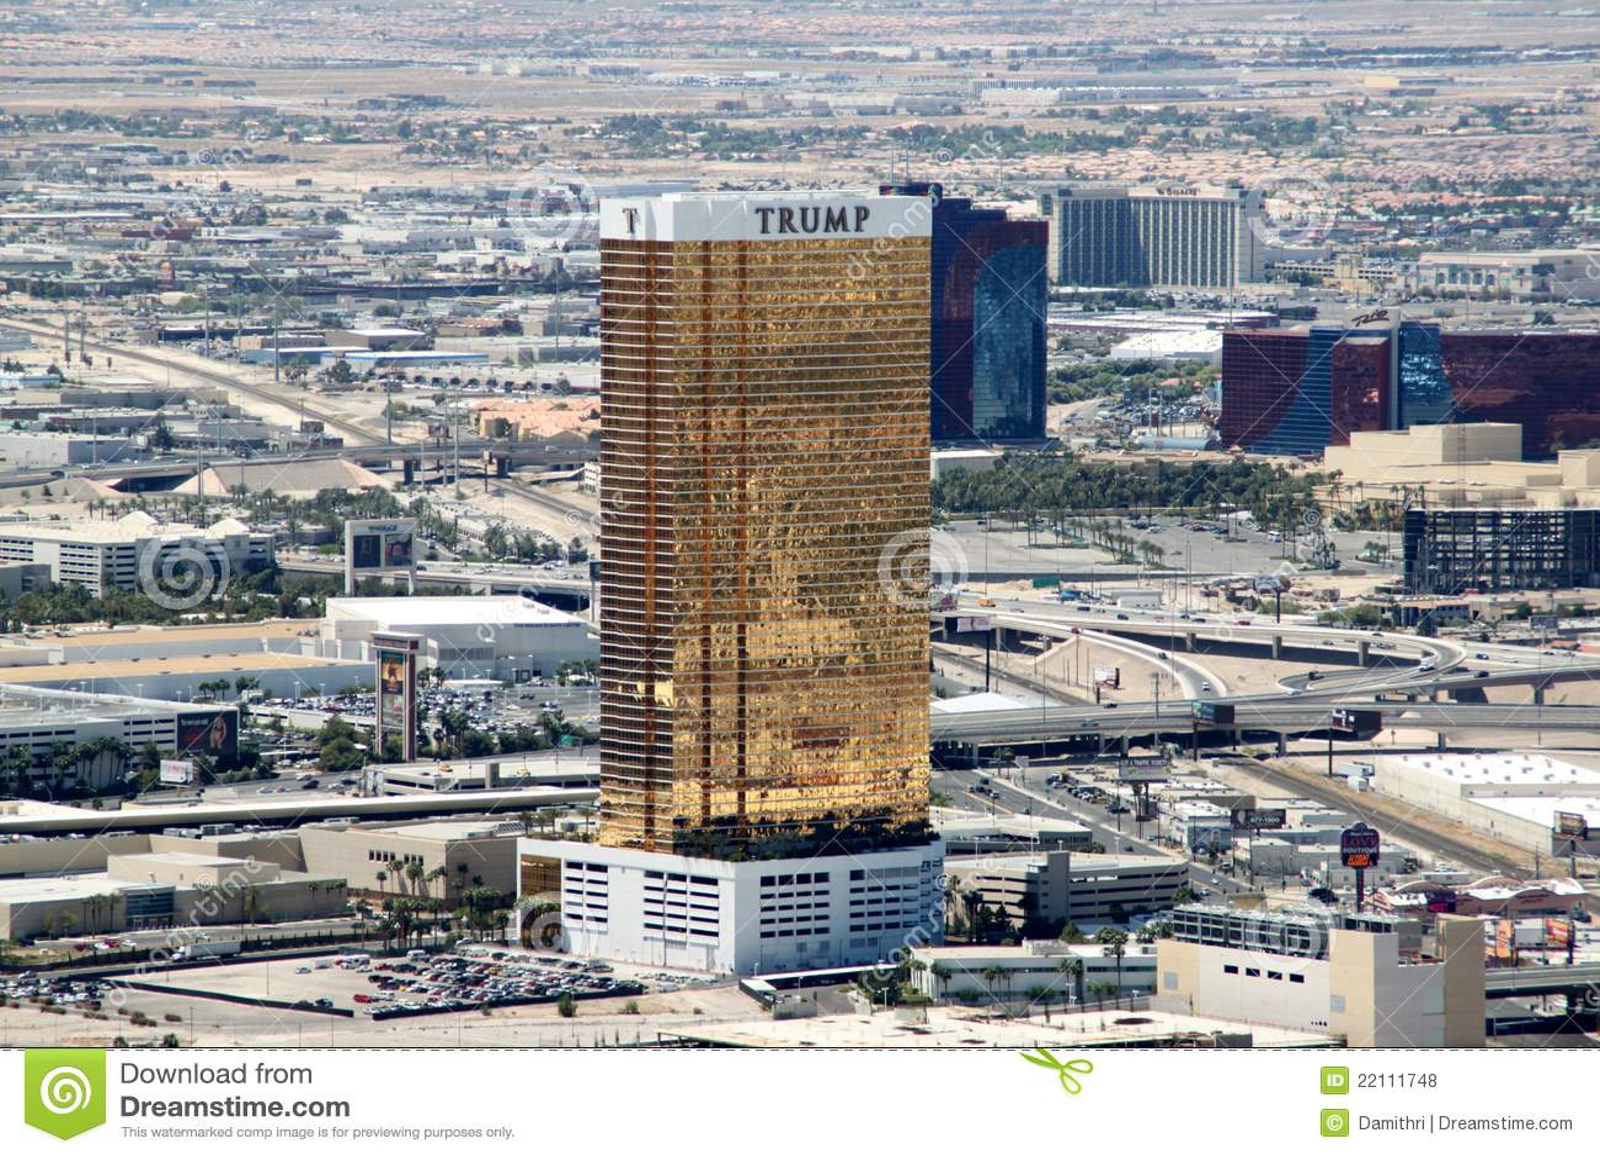 Trump International Hotel, Las Vegas Editorial Stock Photo - Image ...